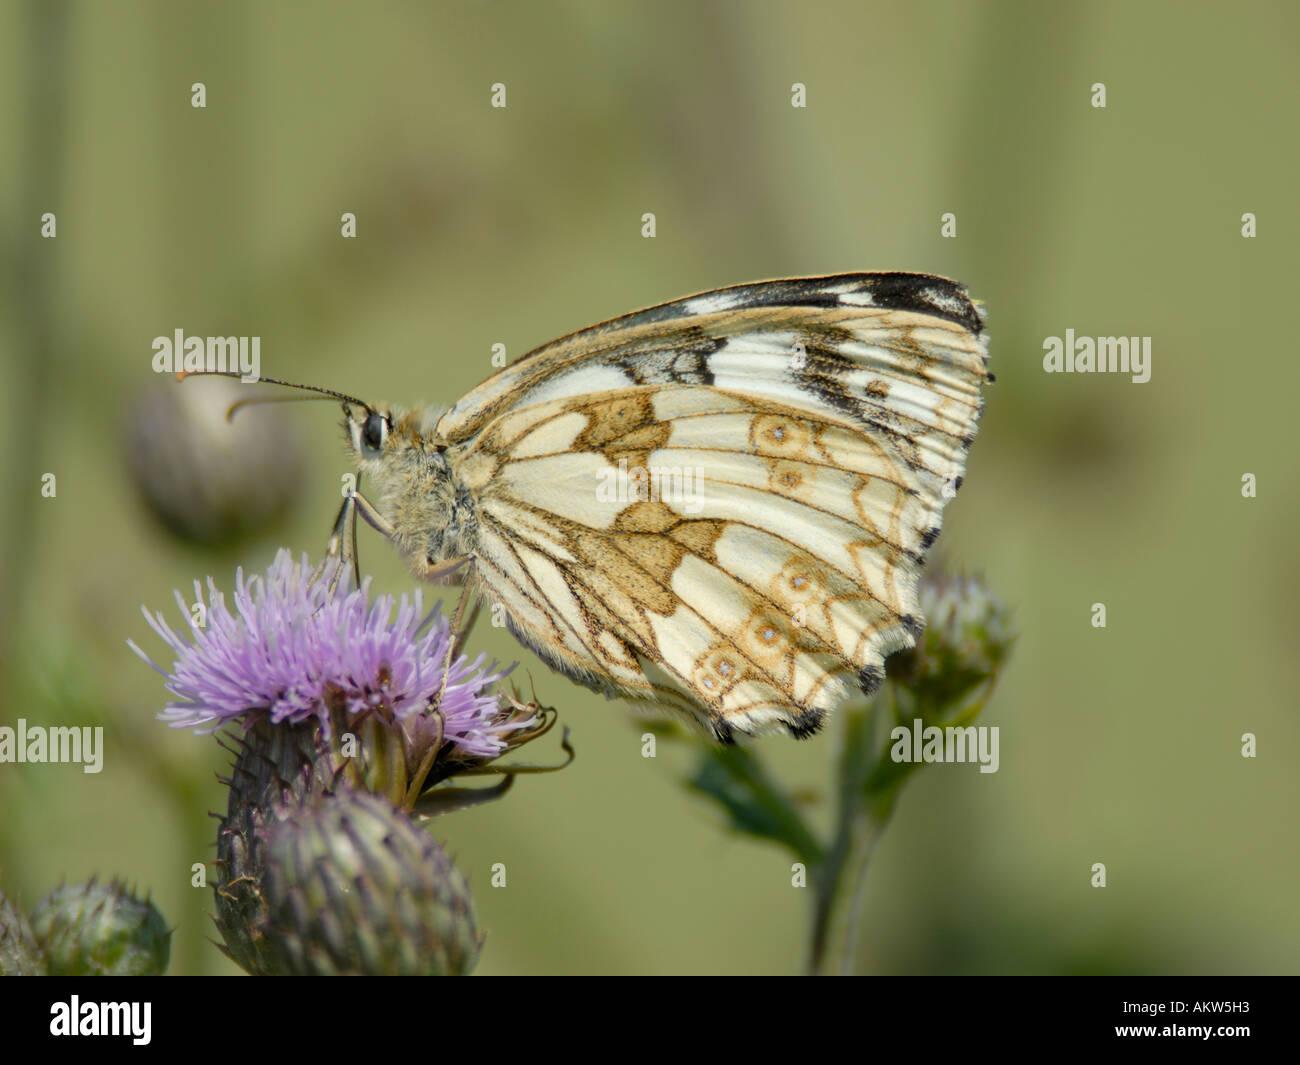 Female Marbled White butterfly Melanargia galathea feeding on a creeping thistle Stock Photo